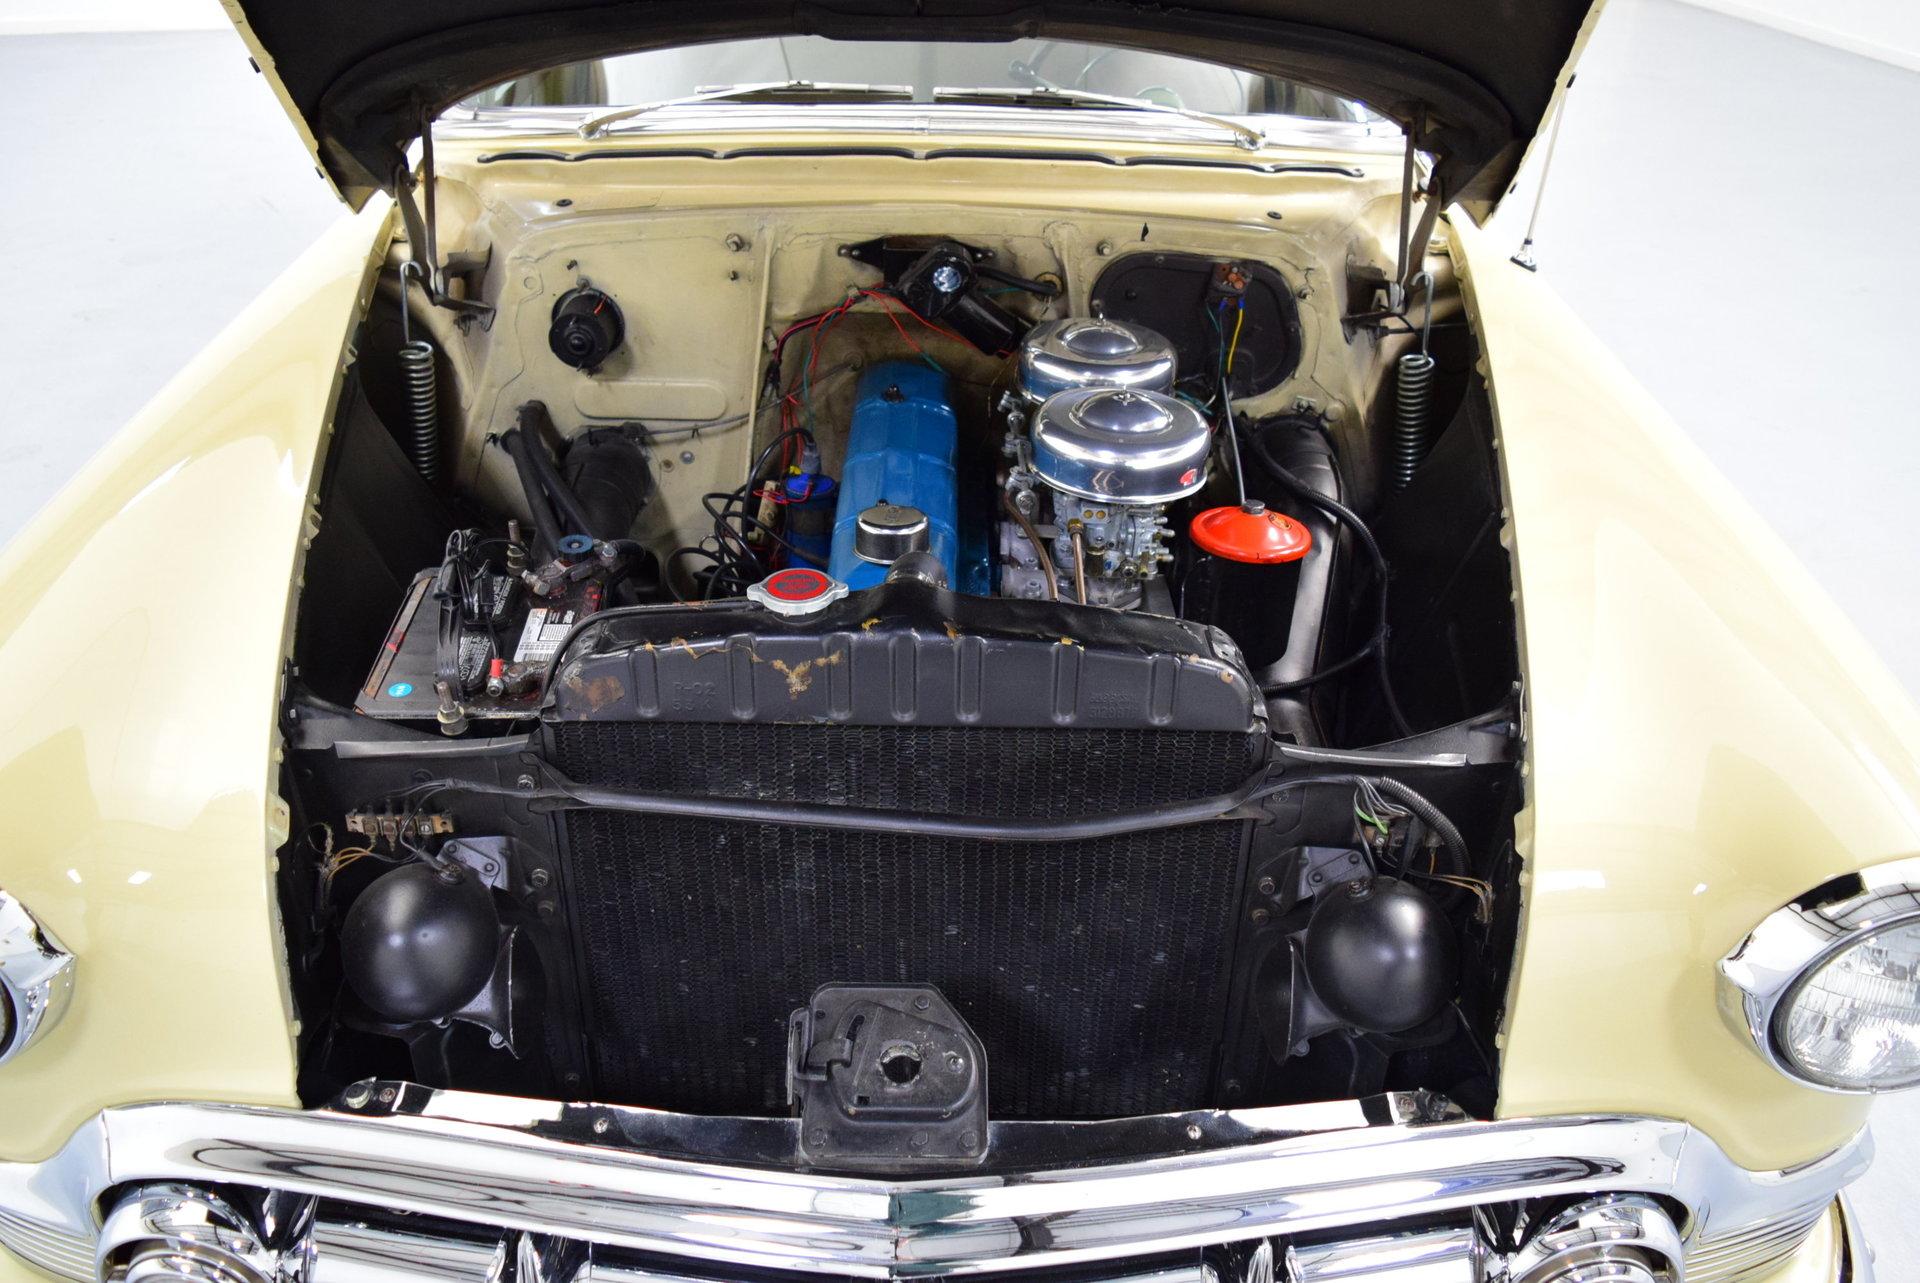 Chevrolet Mooresville1968 C10 Shelton Classics 1978 Bel Air 1953 Amp Performance